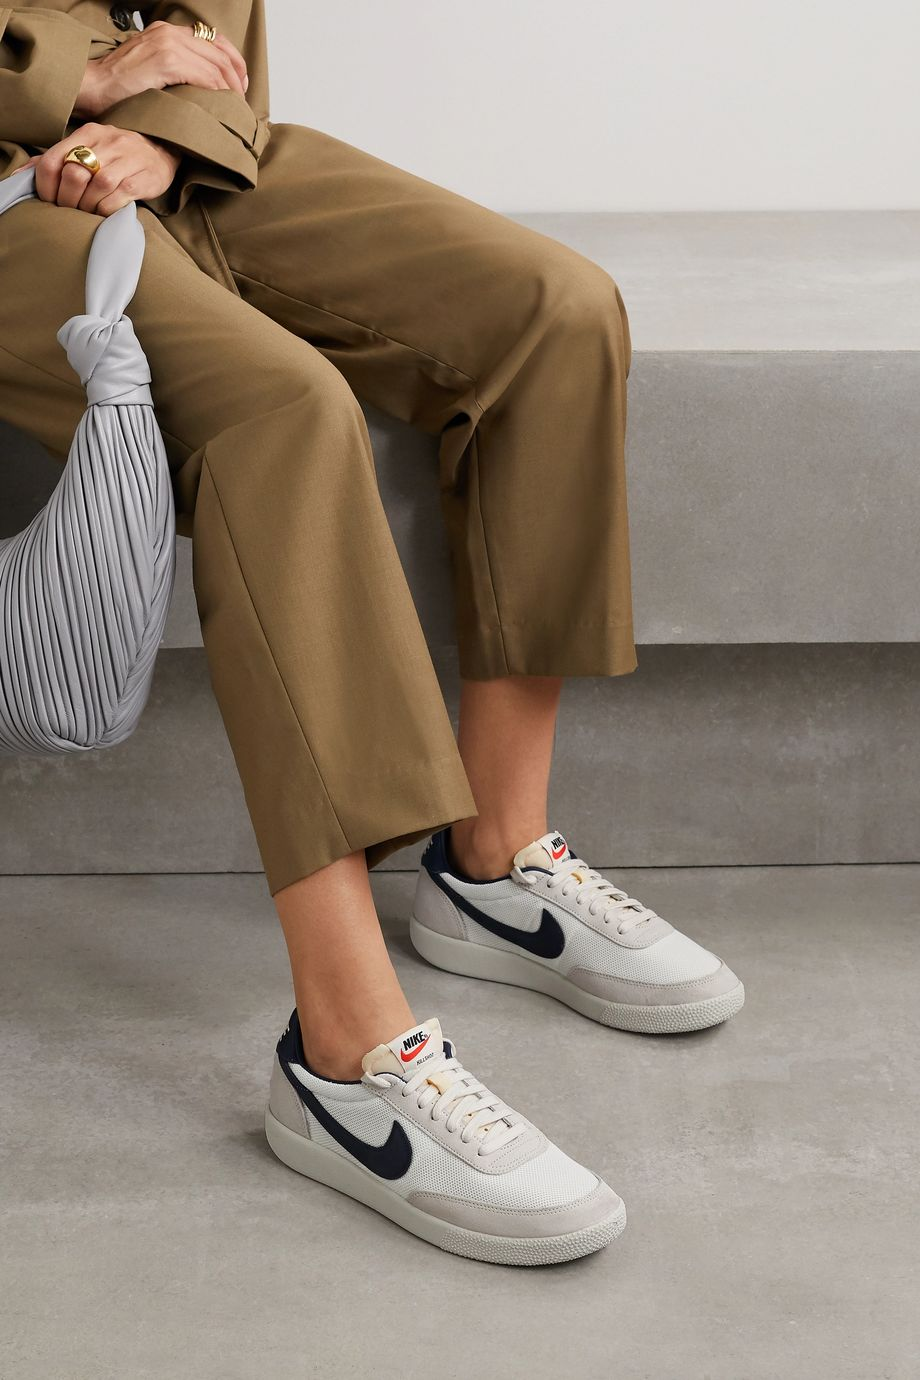 Nike Killshot OG SP mesh, leather and suede sneakers